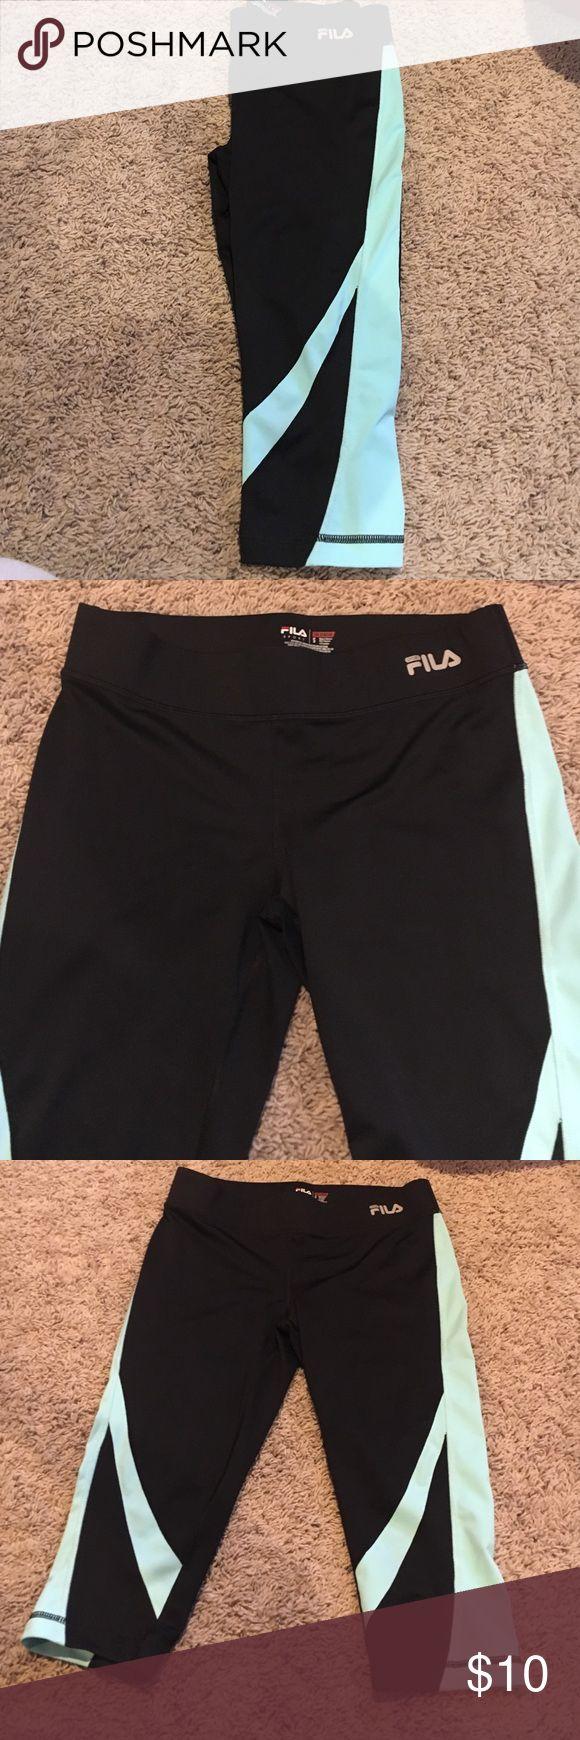 Fila capri legging Fila active capri leggings. Navy and aqua. Great condition! Fila Pants Leggings